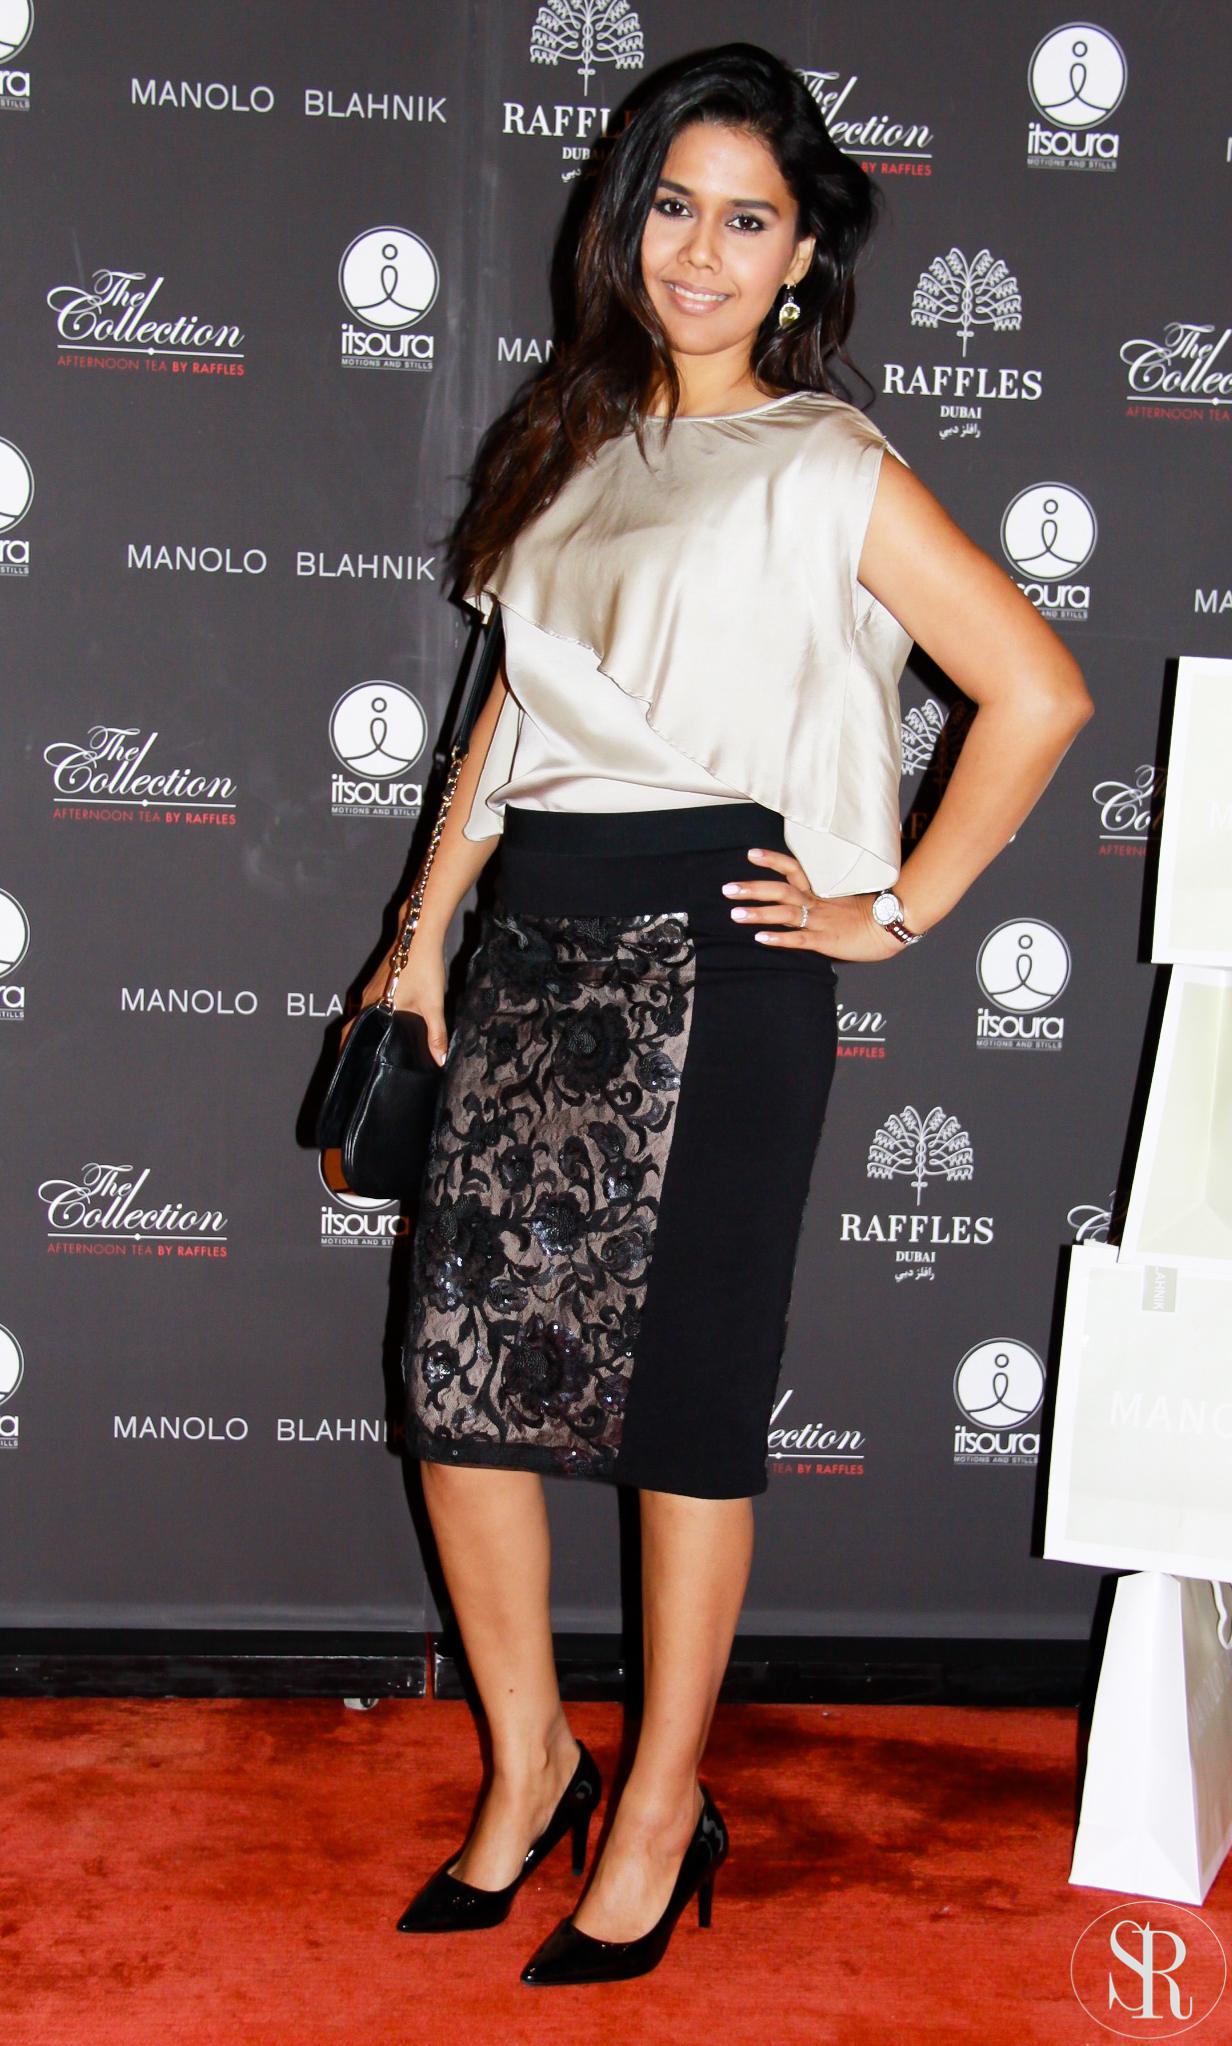 VIP launch of MANOLO BLAHNIK collection Fashion Afternoon Tea by Raffles Dubai-4251.jpg